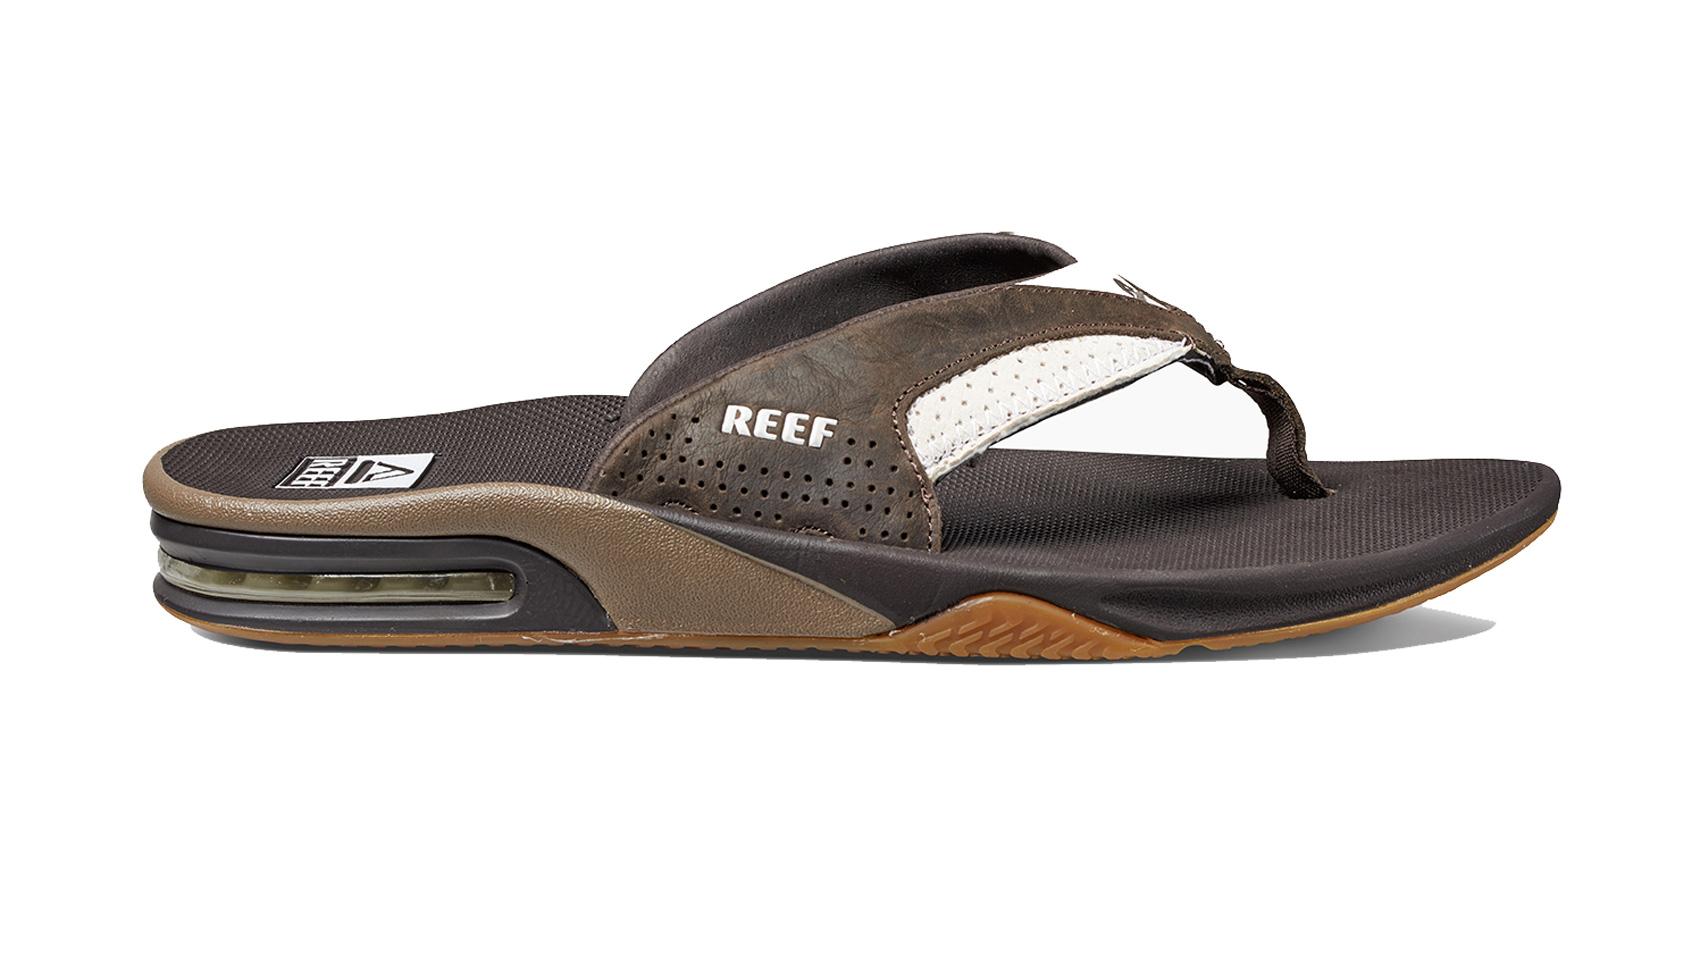 c79e91c500a Sentinel Reef Flip Flops - Leather Fanning - Sandal